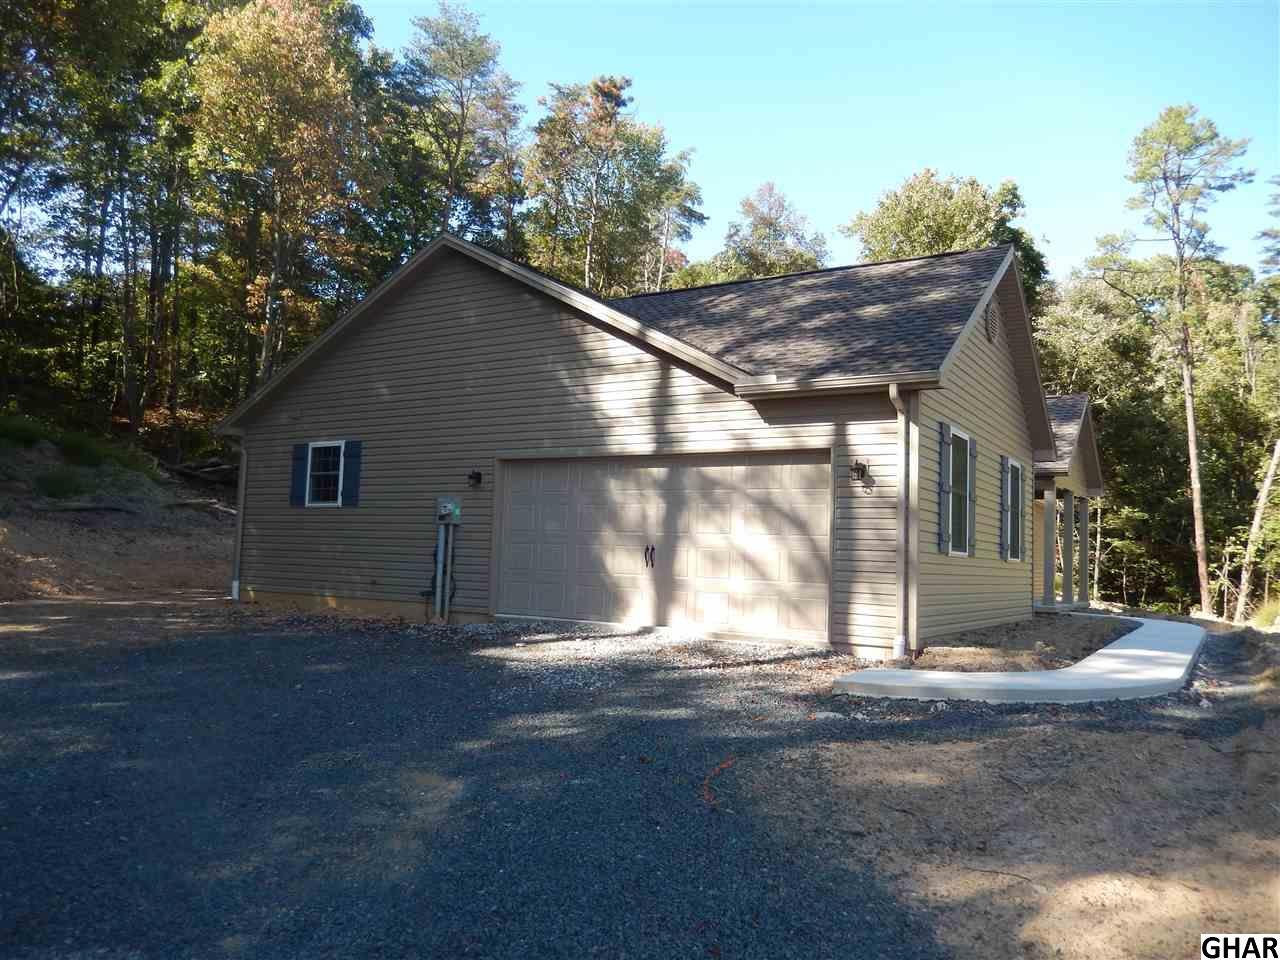 Real Estate for Sale, ListingId: 33764134, Shermans Dale,PA17090